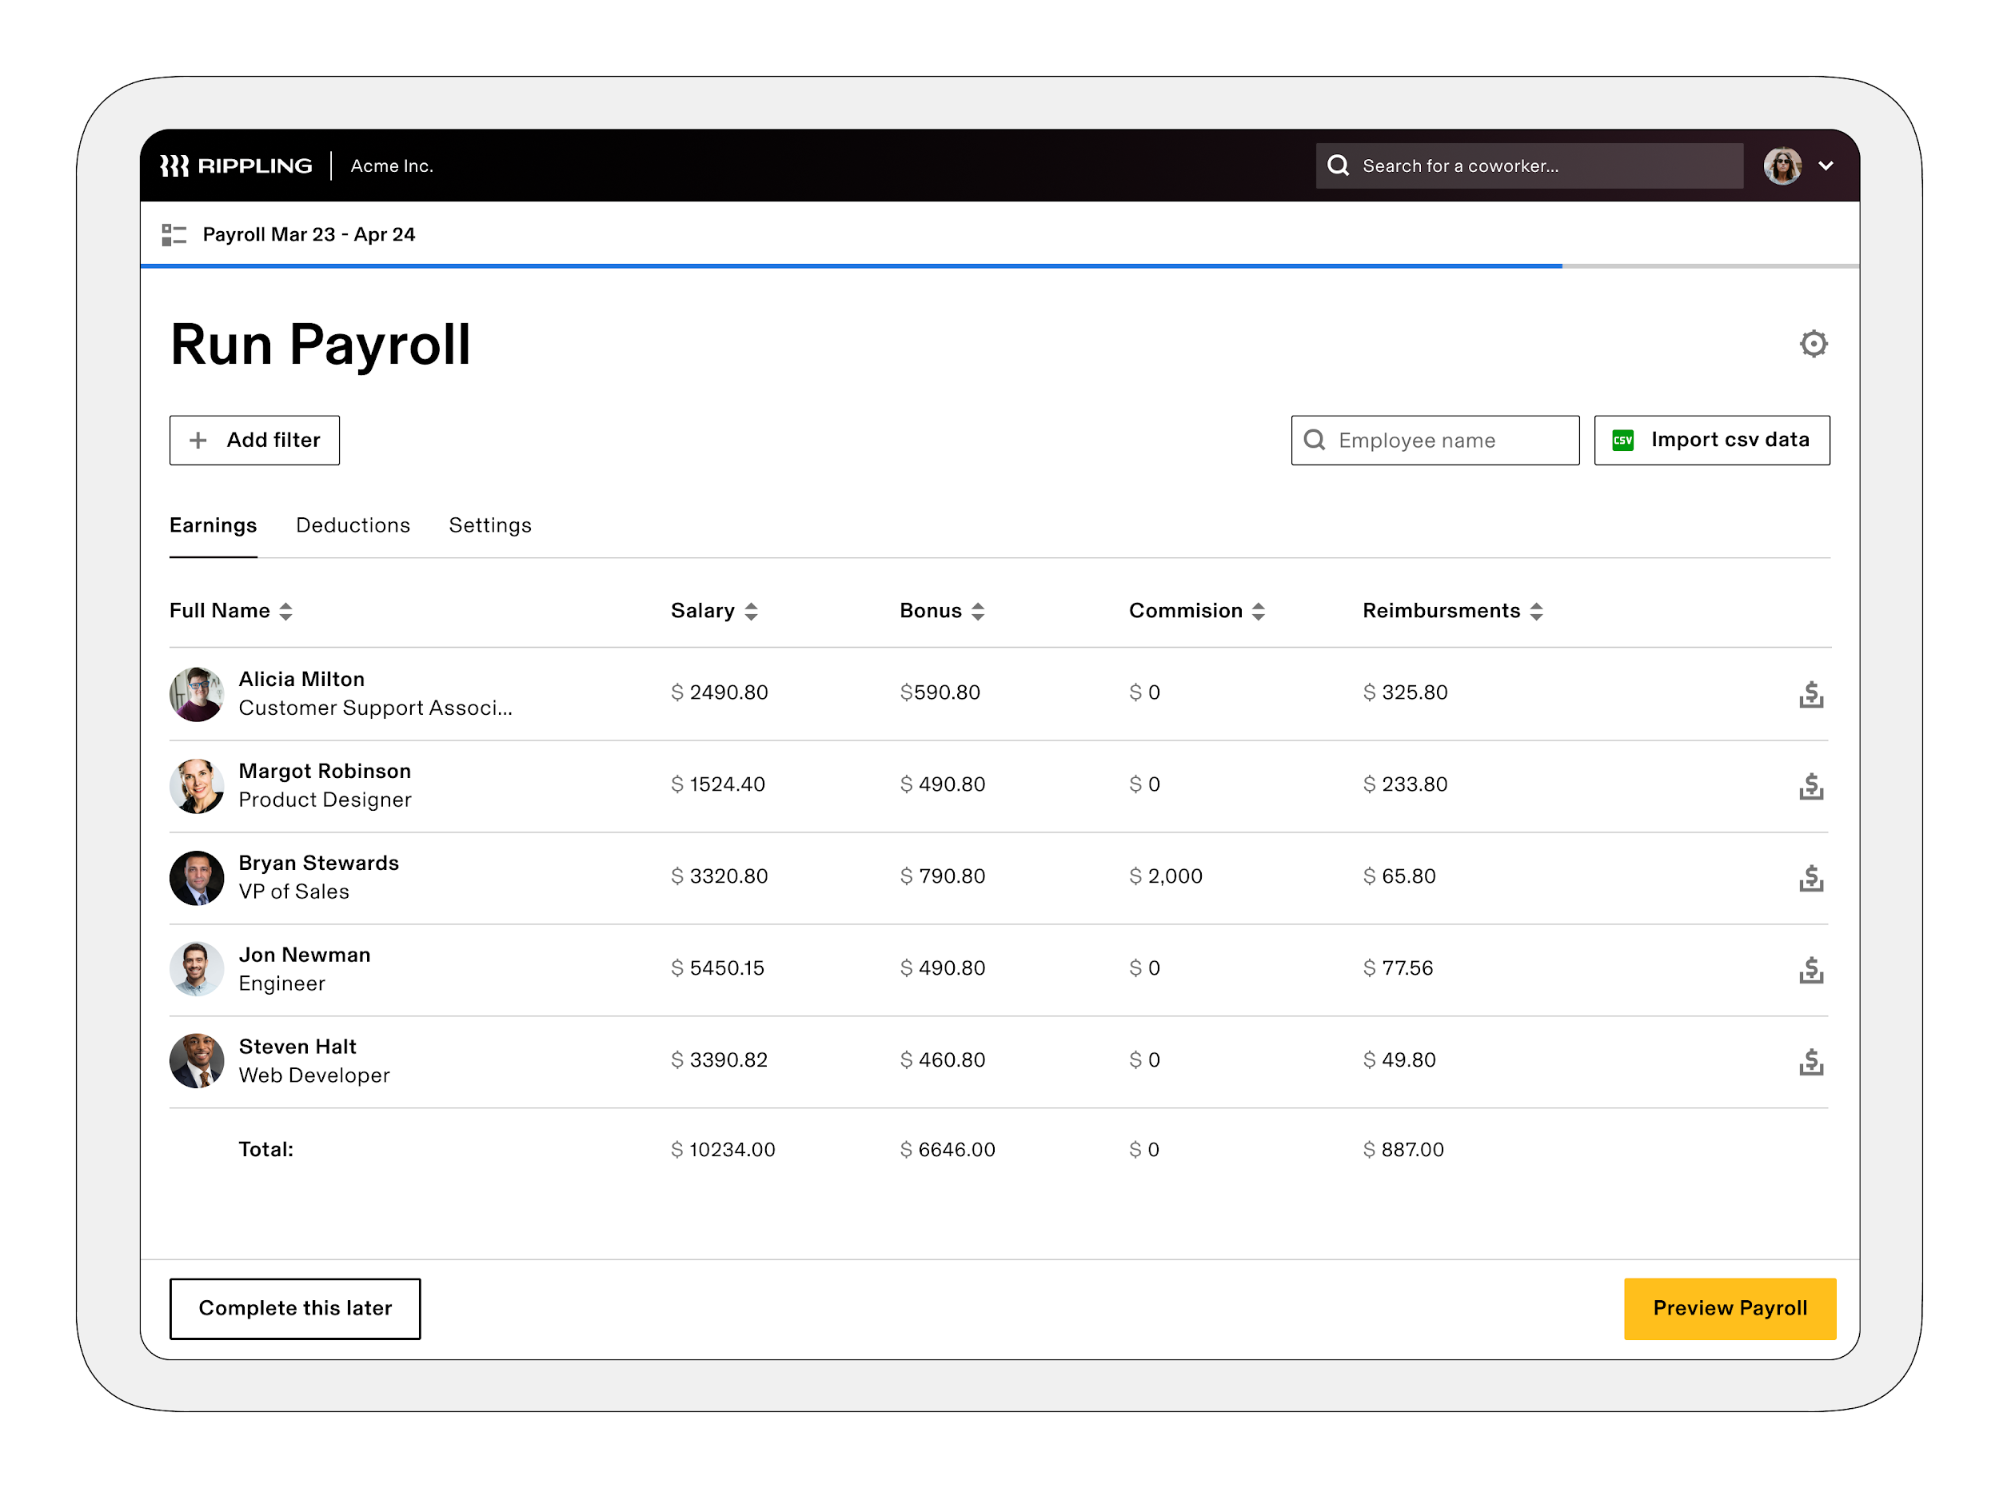 Managing employee payroll in Rippling